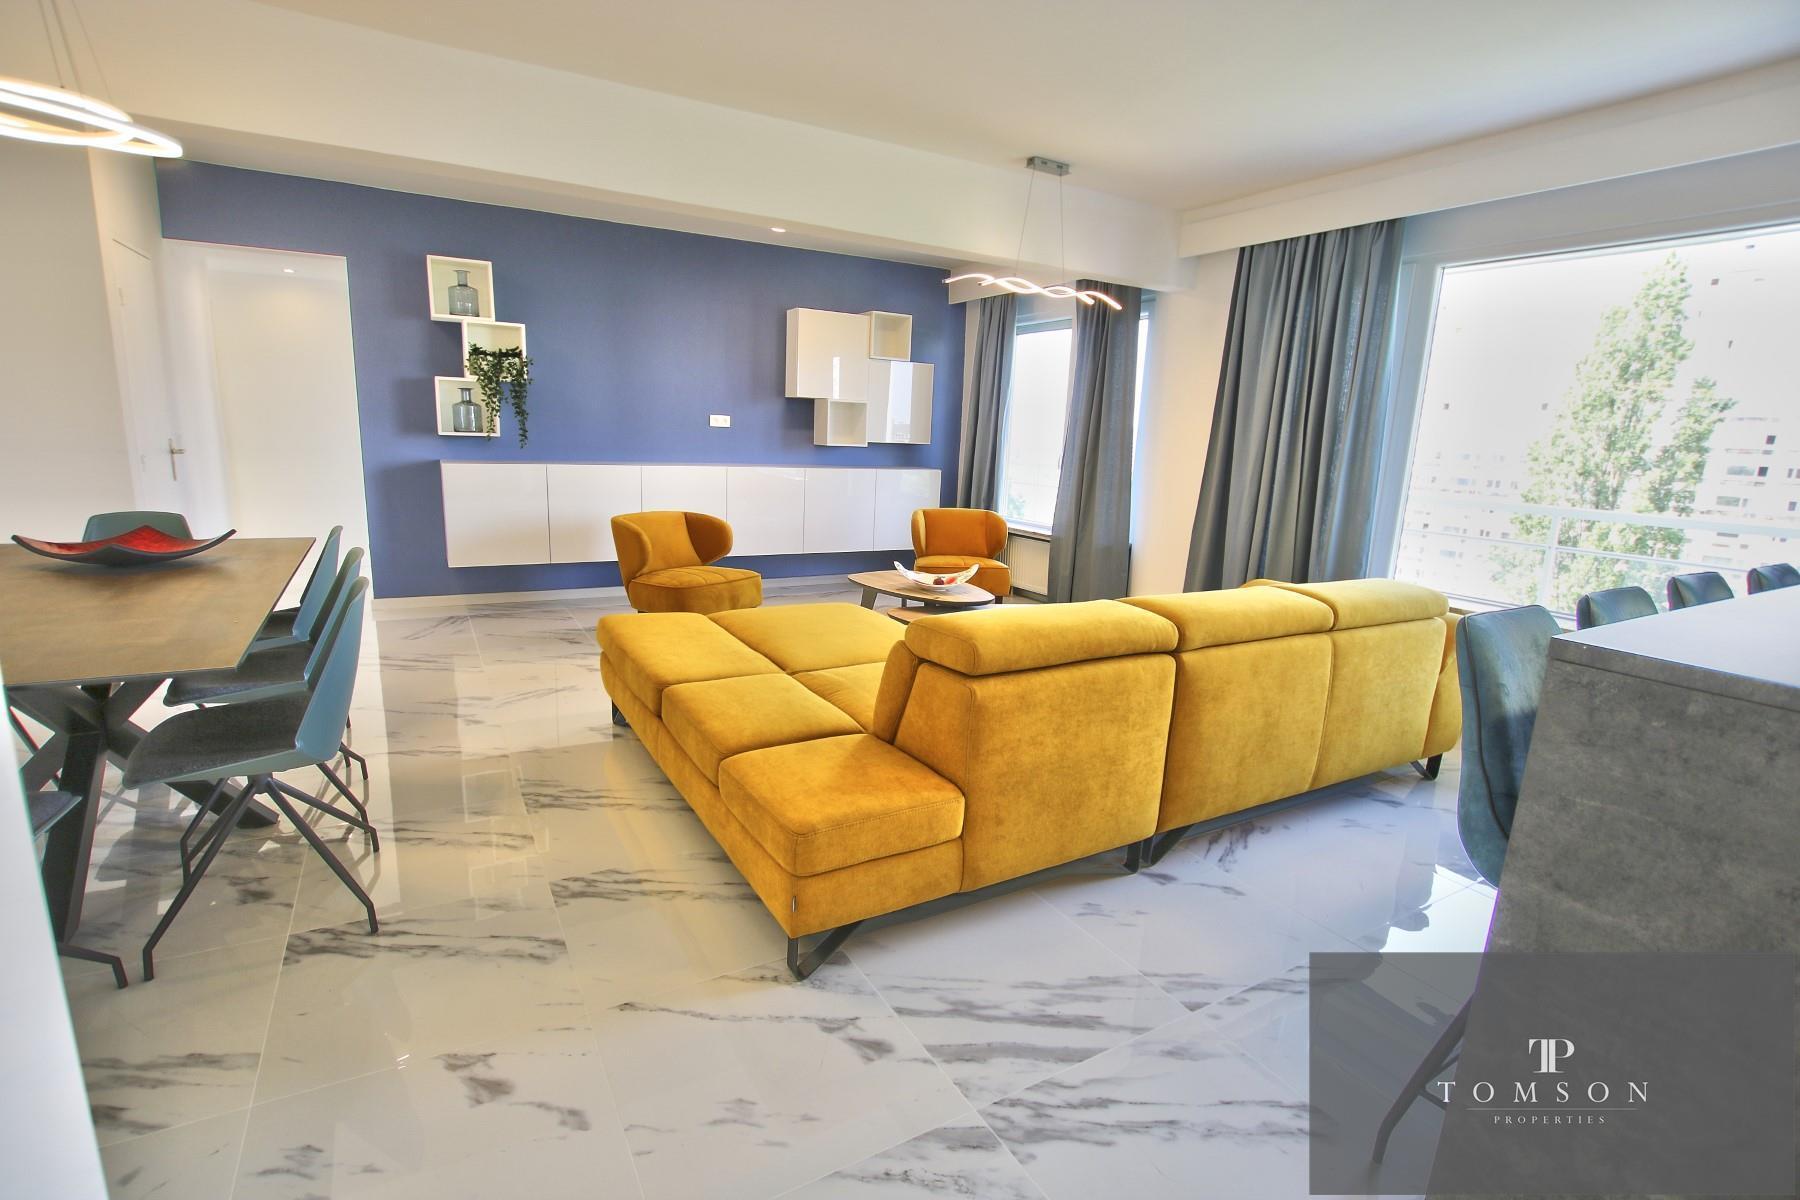 Appartement - Woluwe-Saint-Lambert - #4530510-4